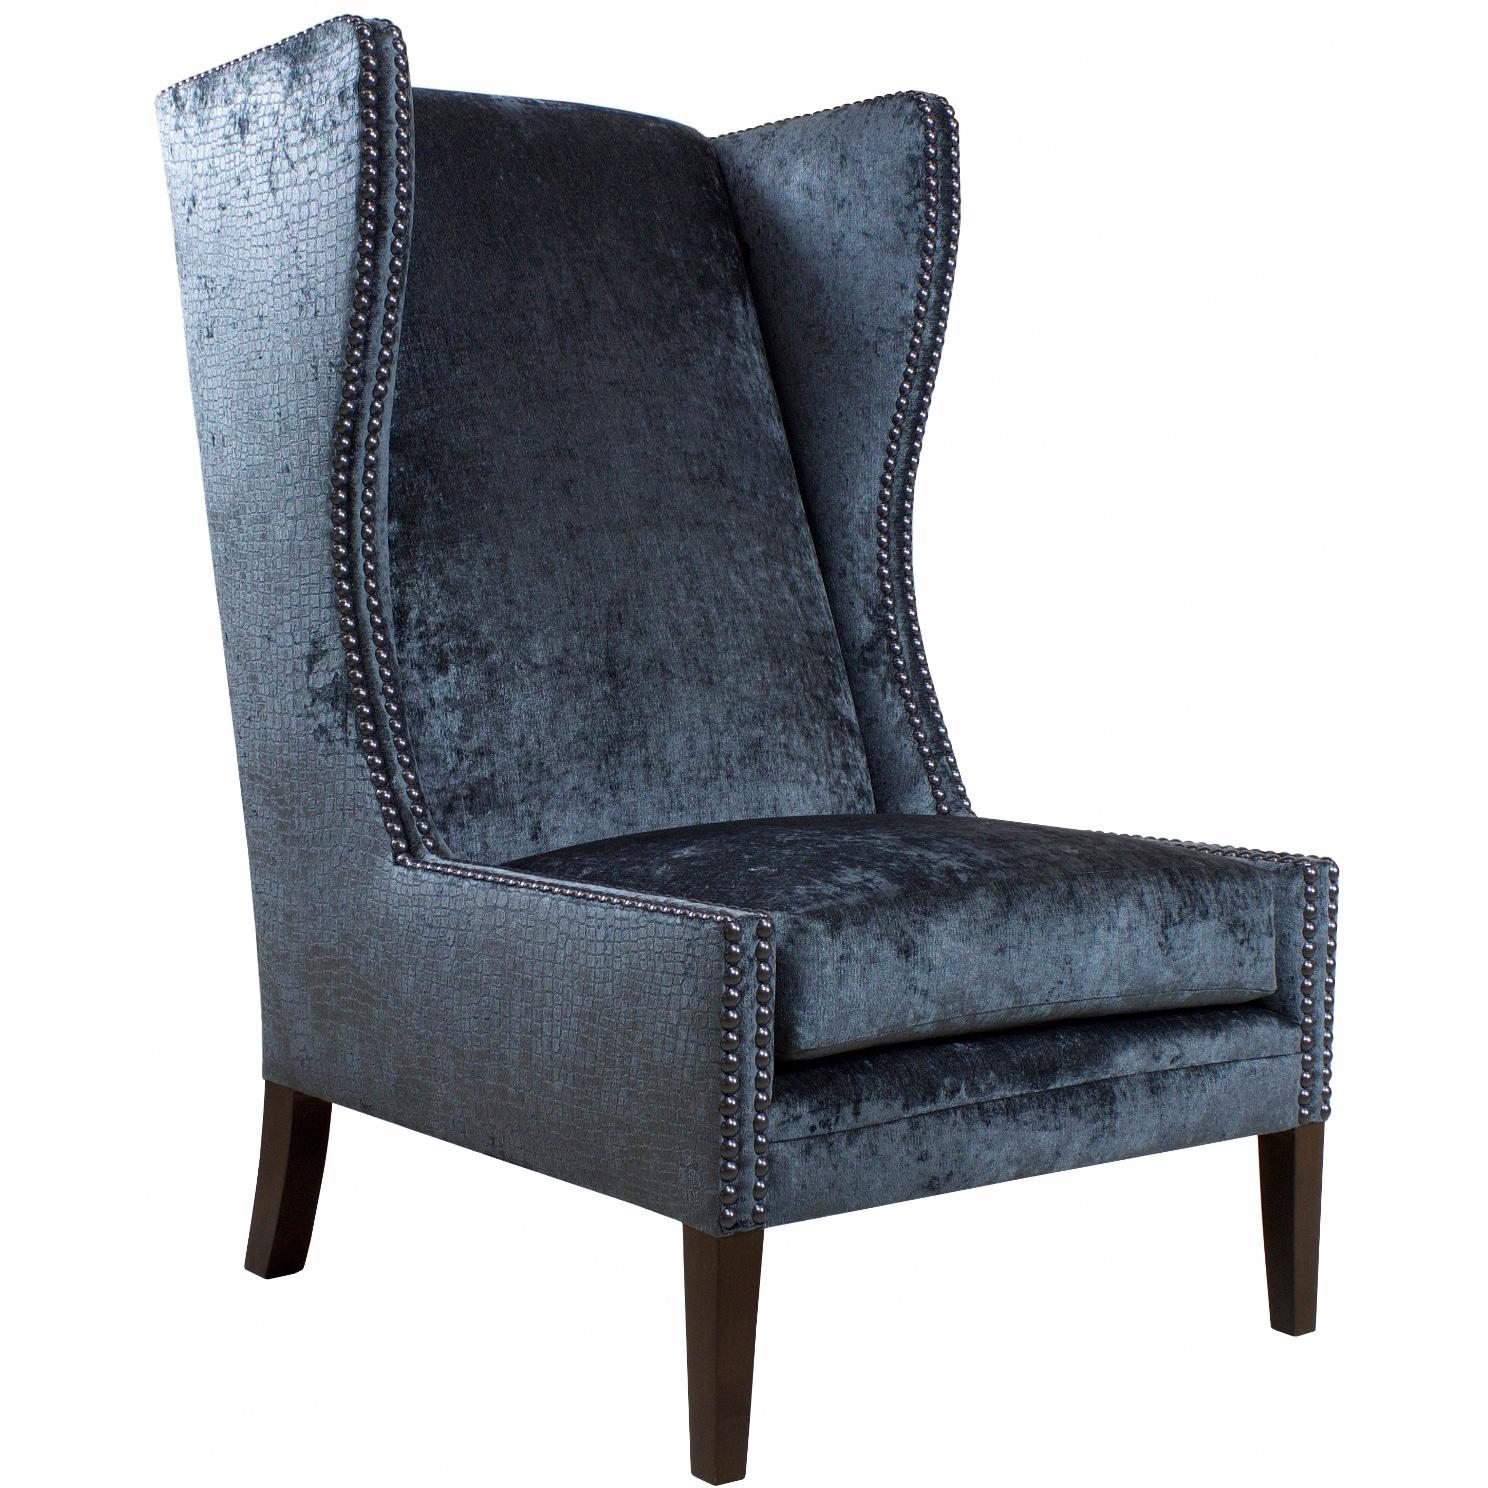 jar designs furniture. Fine Furniture Shop JAR Designs U0027Aliceu0027 Blue Wingback Chair  Free Shipping Today  Overstockcom 11815486 And Jar Furniture G